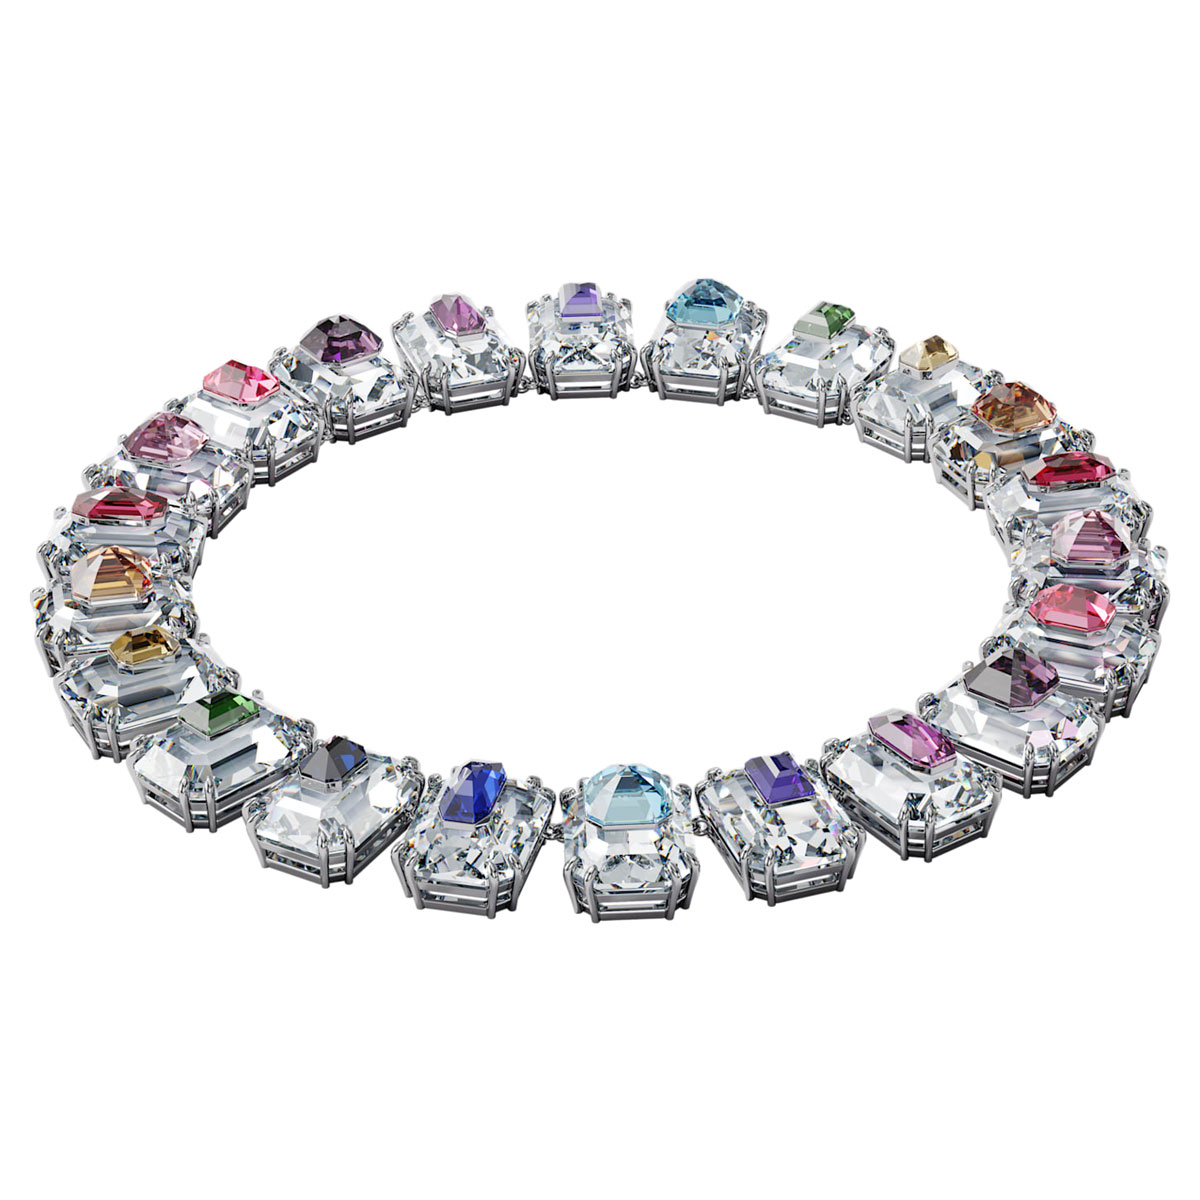 Swarovski Chroma Choker Necklace , Oversized Crystals, Multicolored, Rhodium Plated